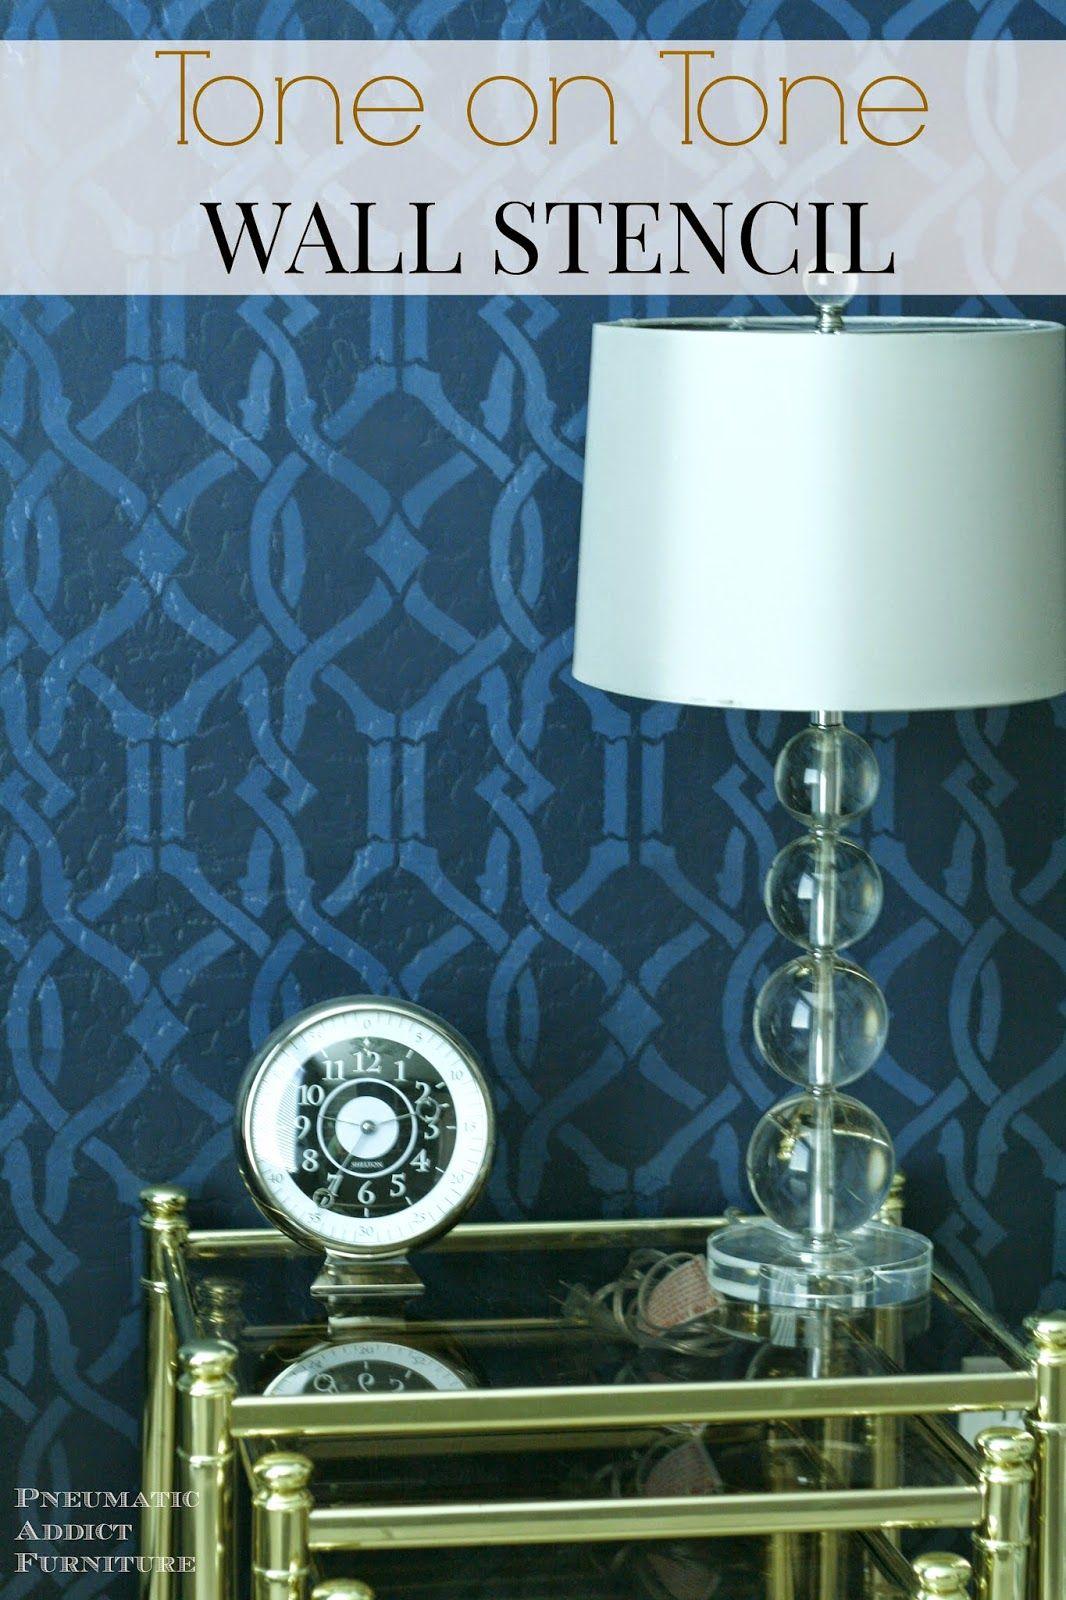 Tone On Tone Painting tone on tone wall stencil   -♥- decor: wondrous walls